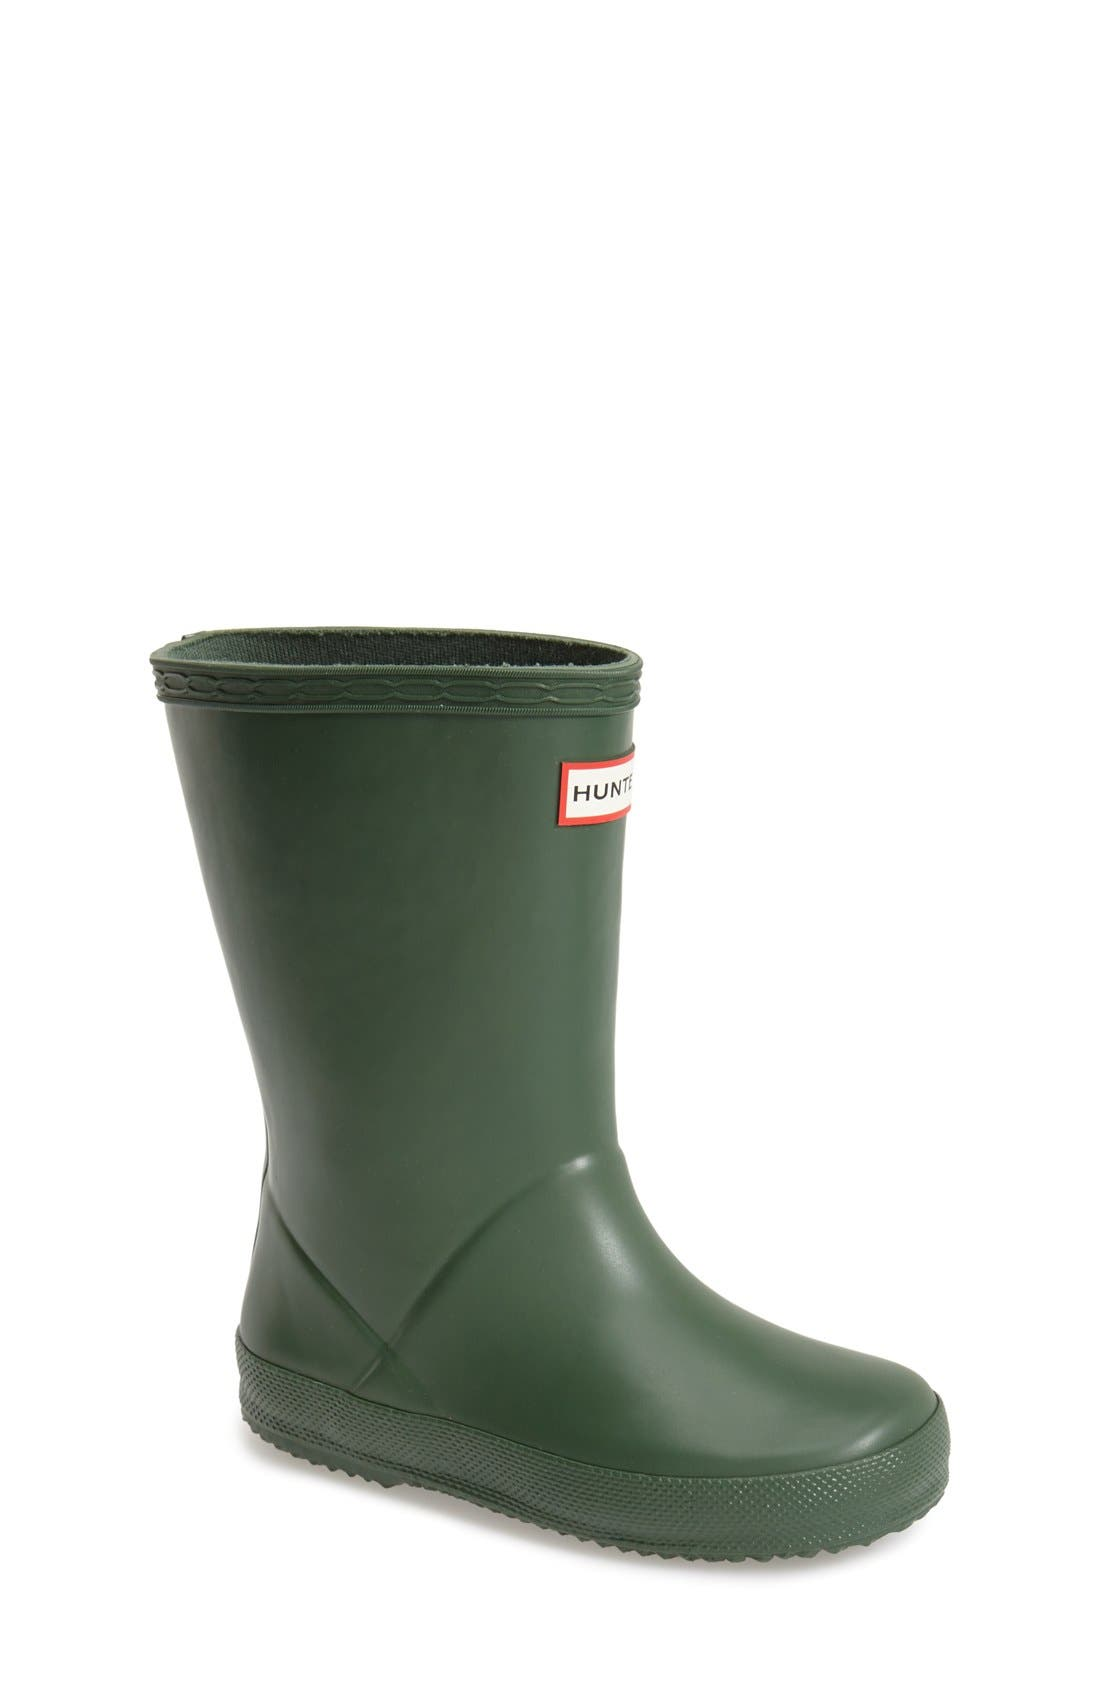 HUNTER 'First Classic' Rain Boot